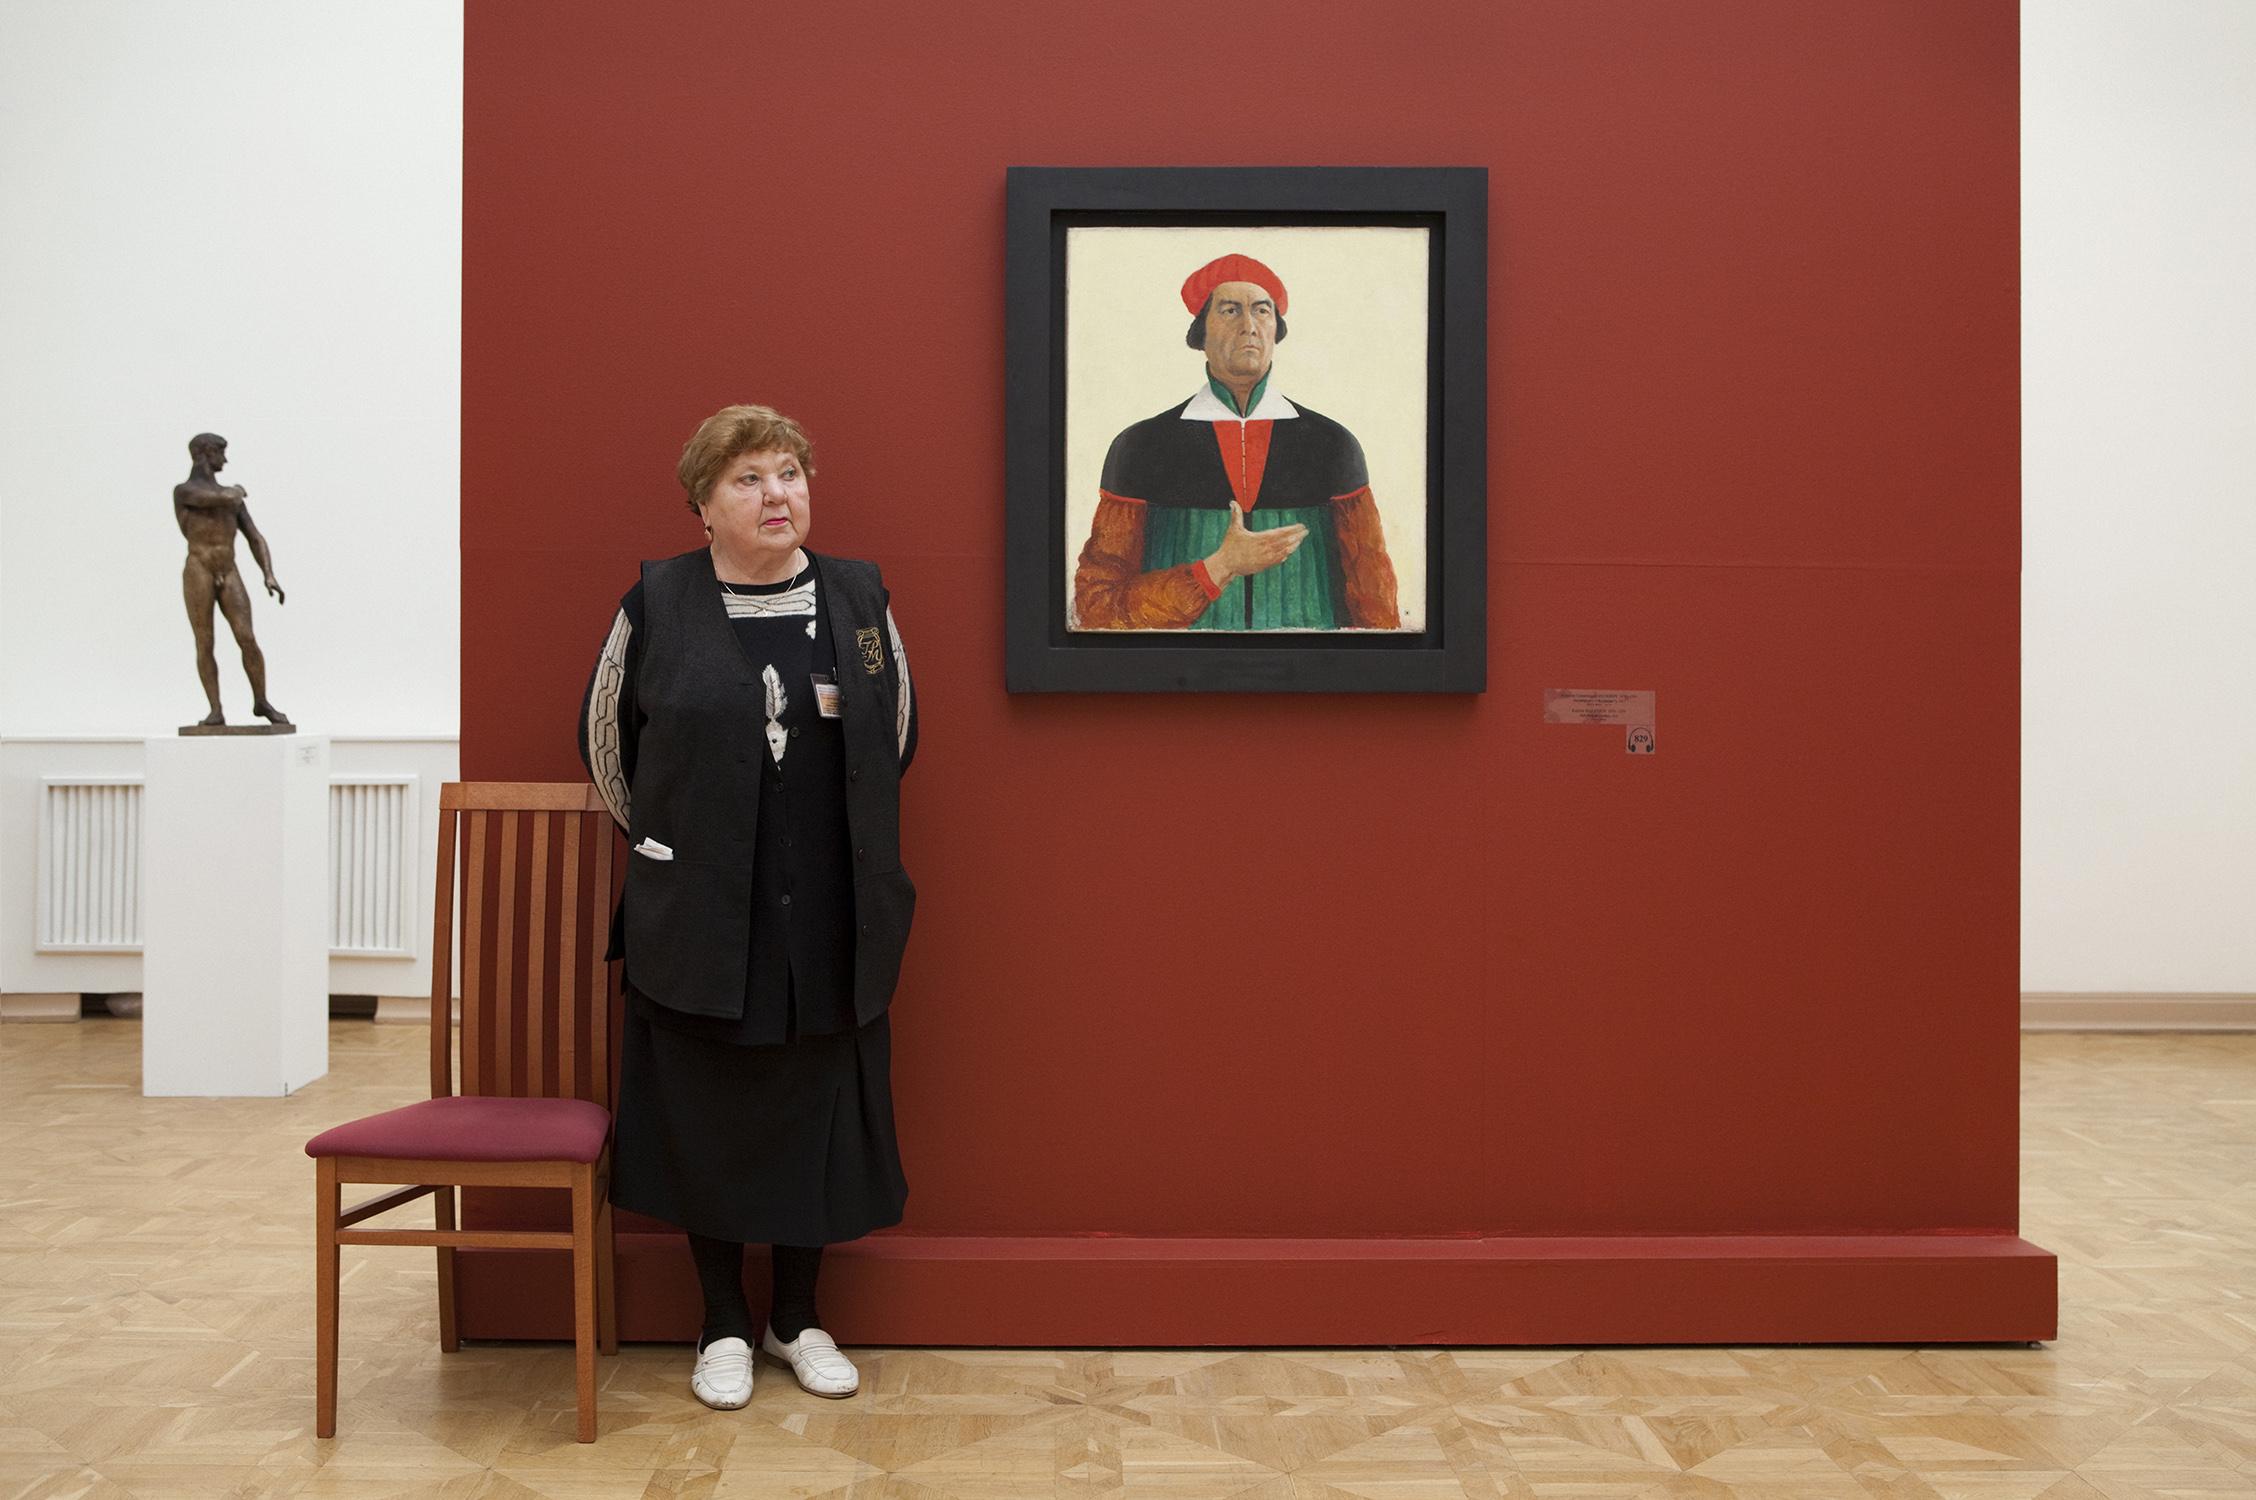 Malevich's Self Portrait, Russian State Museum 2009